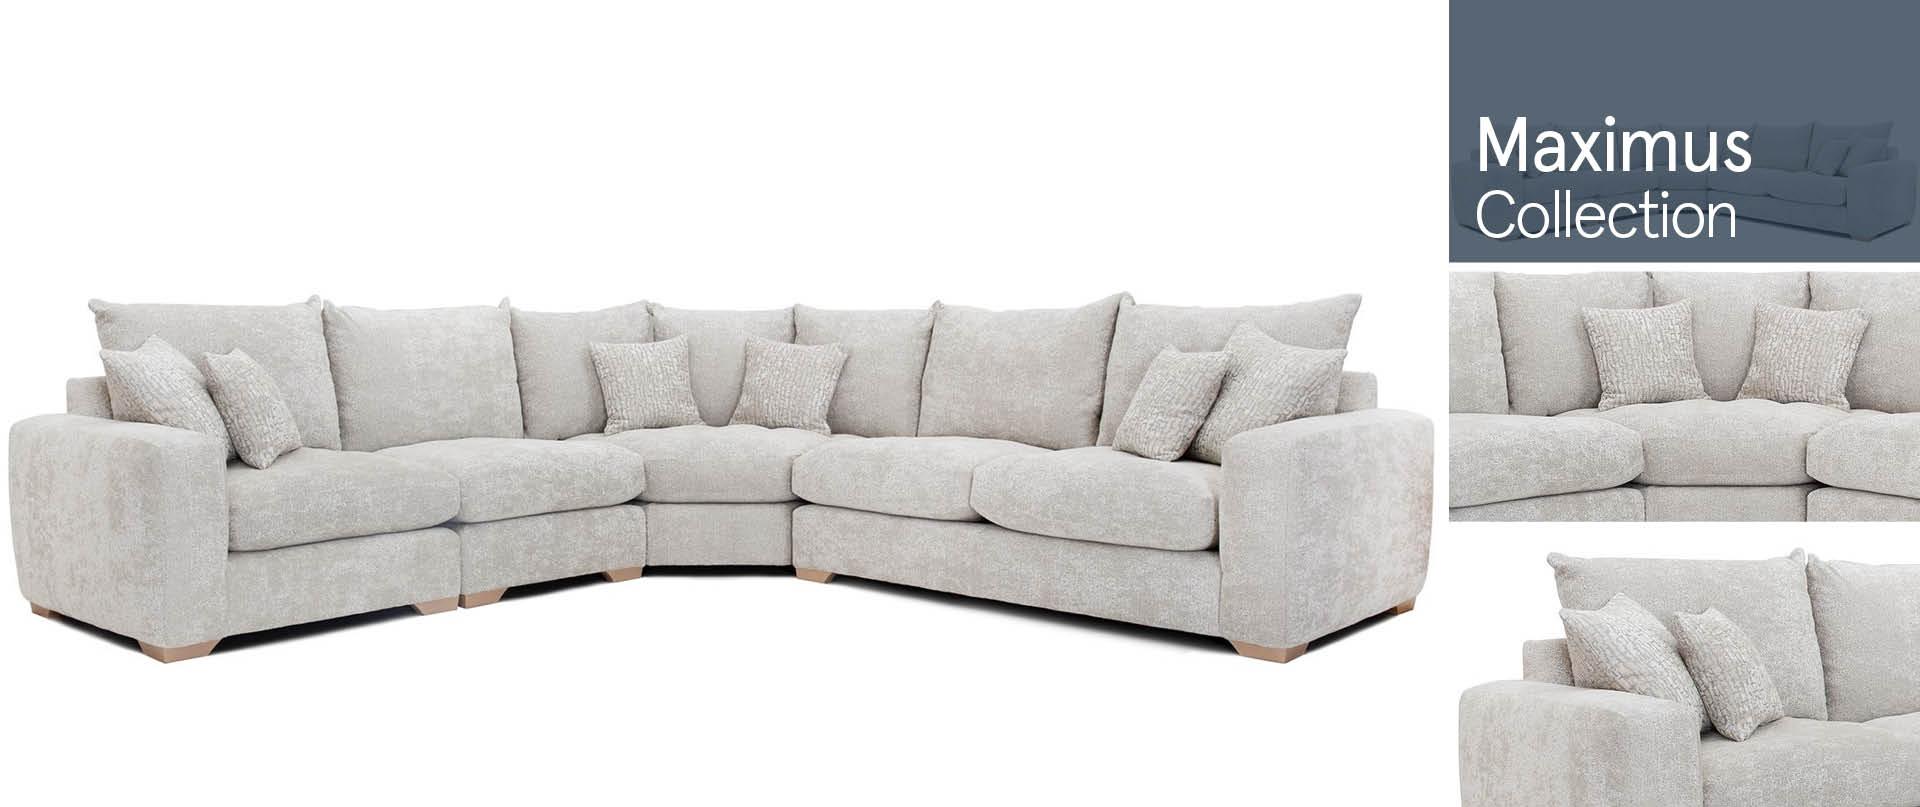 Maximus All Fabric Sofa Ranges